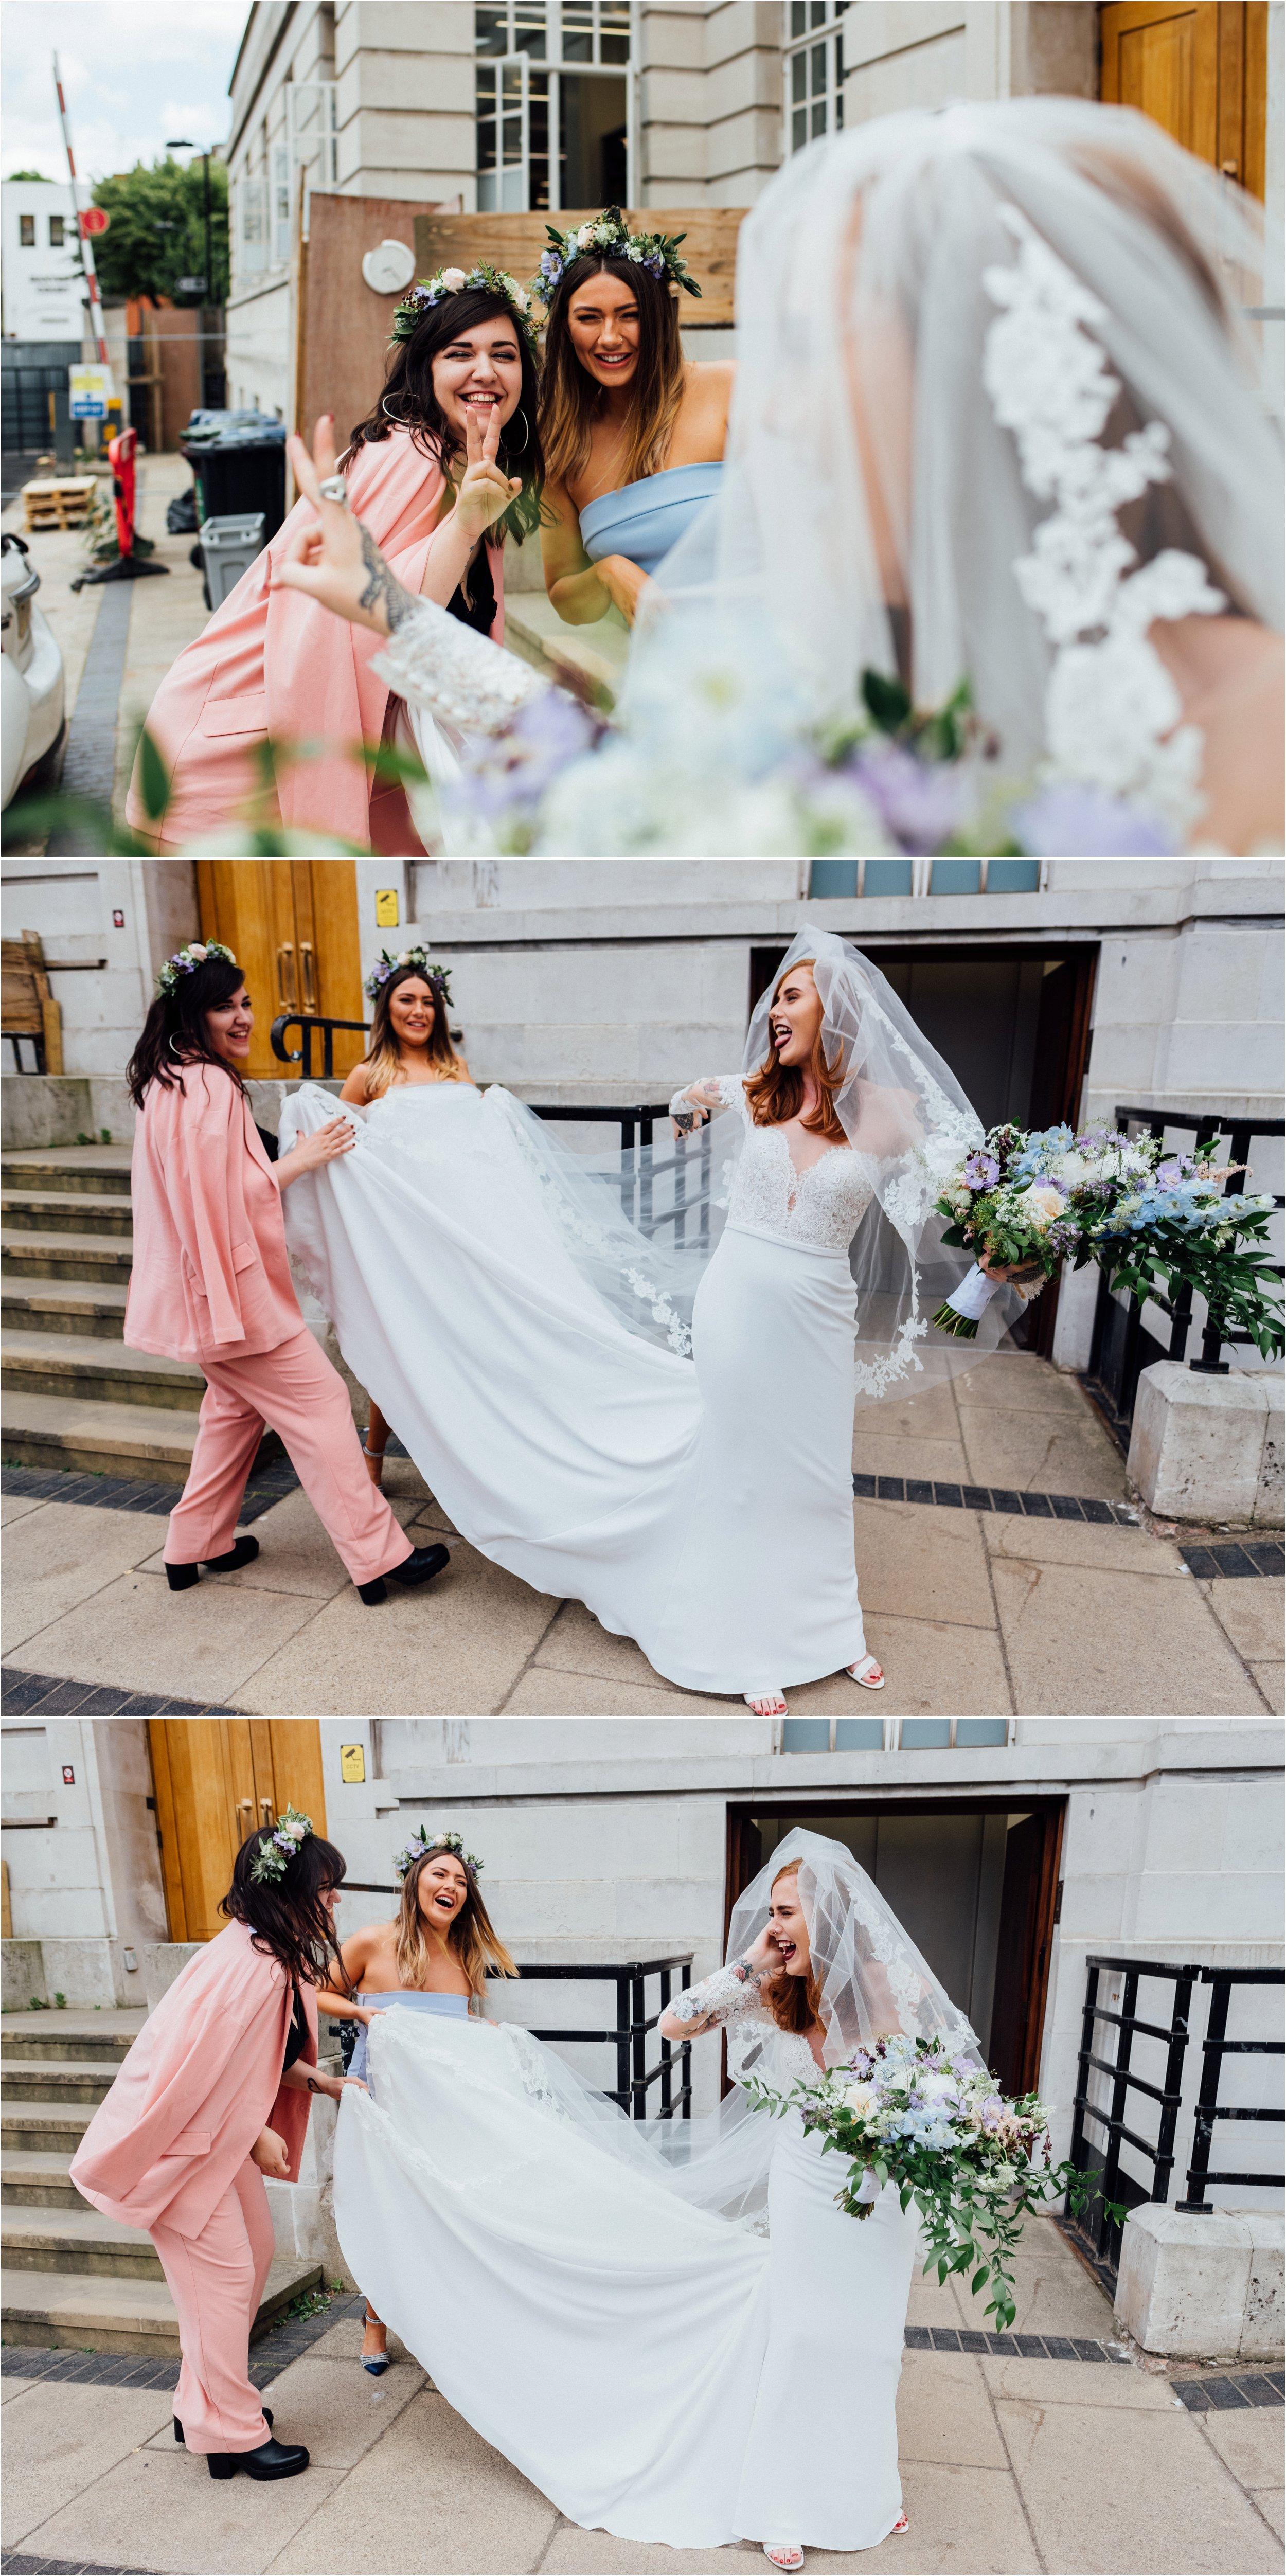 Hackney town hall wedding photography_0047.jpg